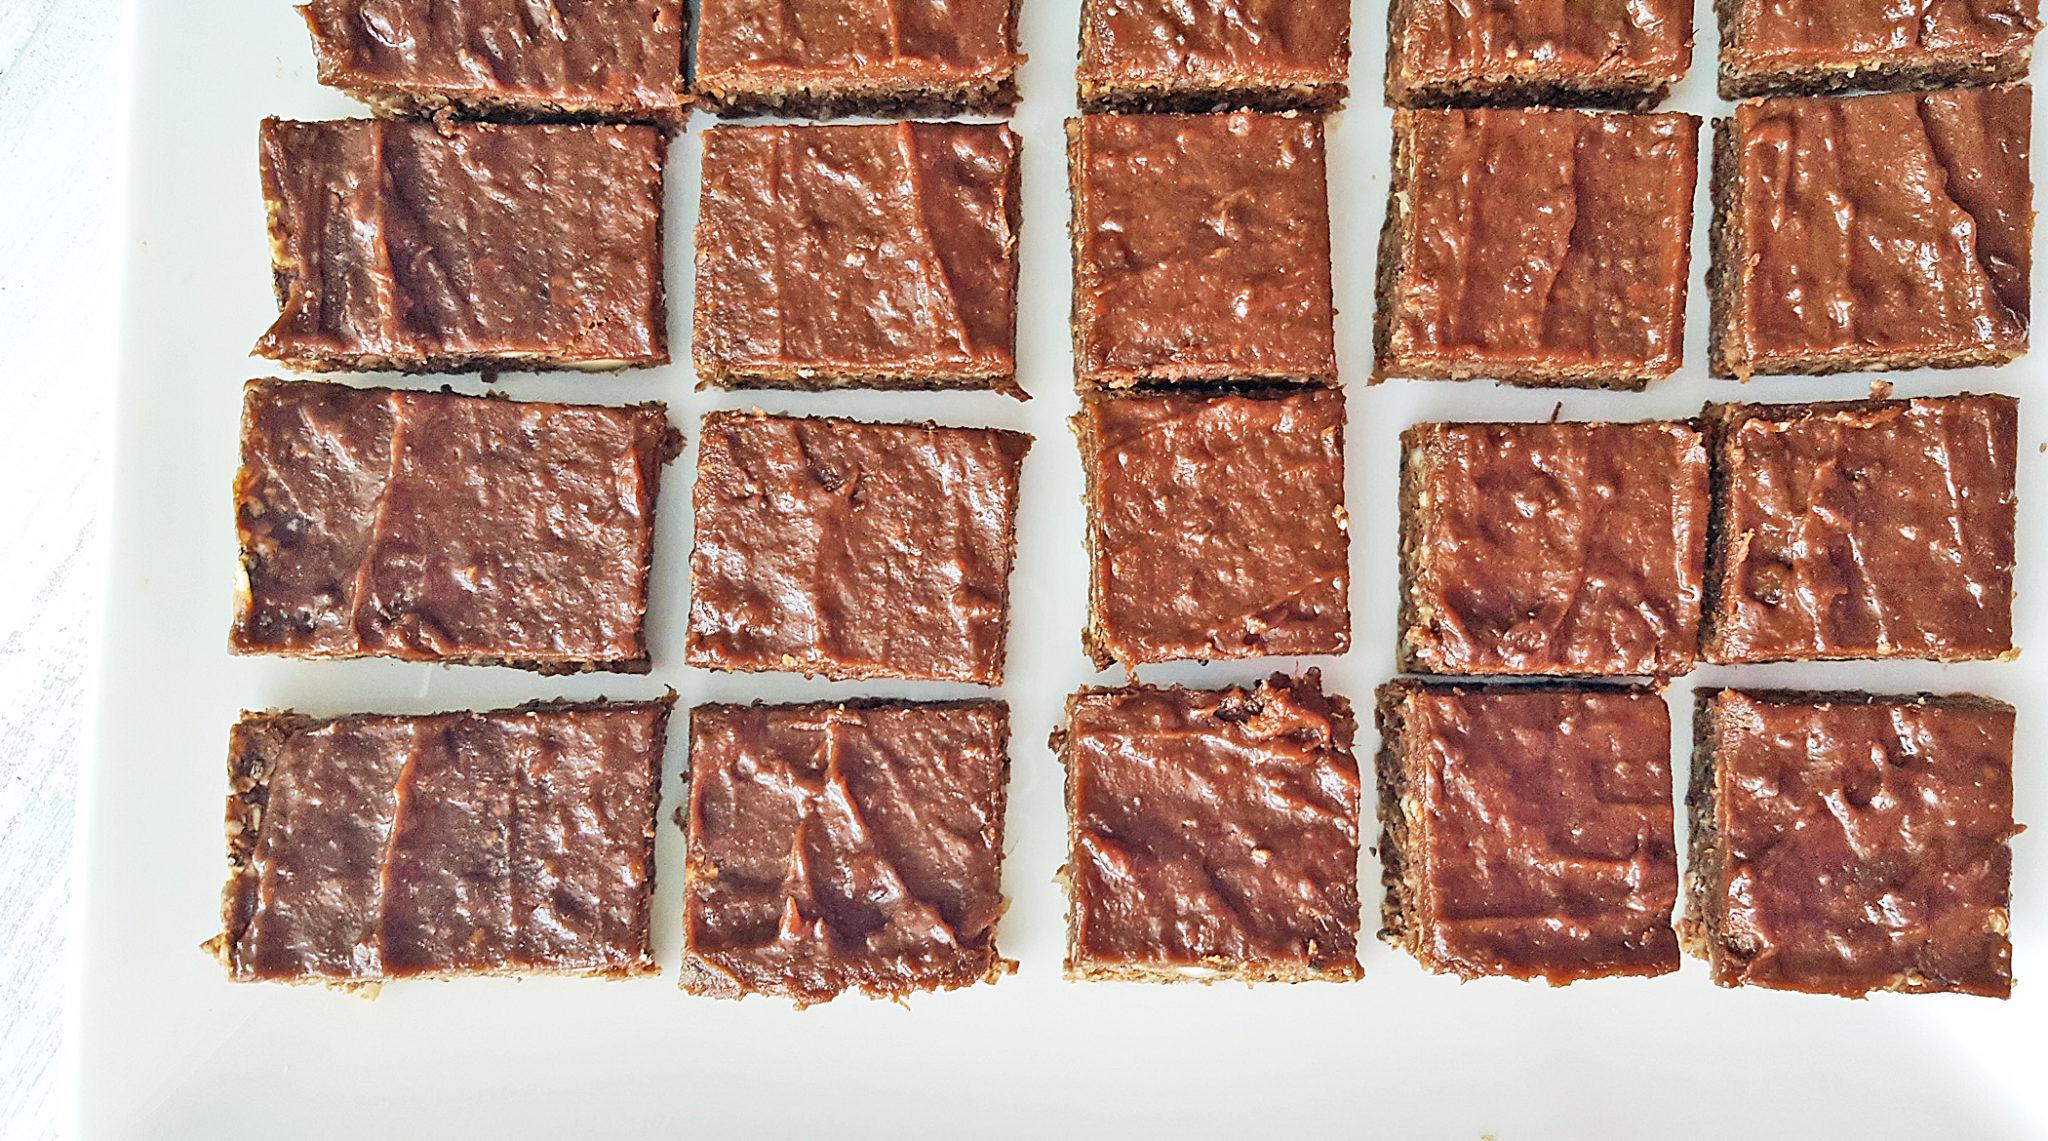 Recipe: Chocolate Date-Glazed Protein Bars